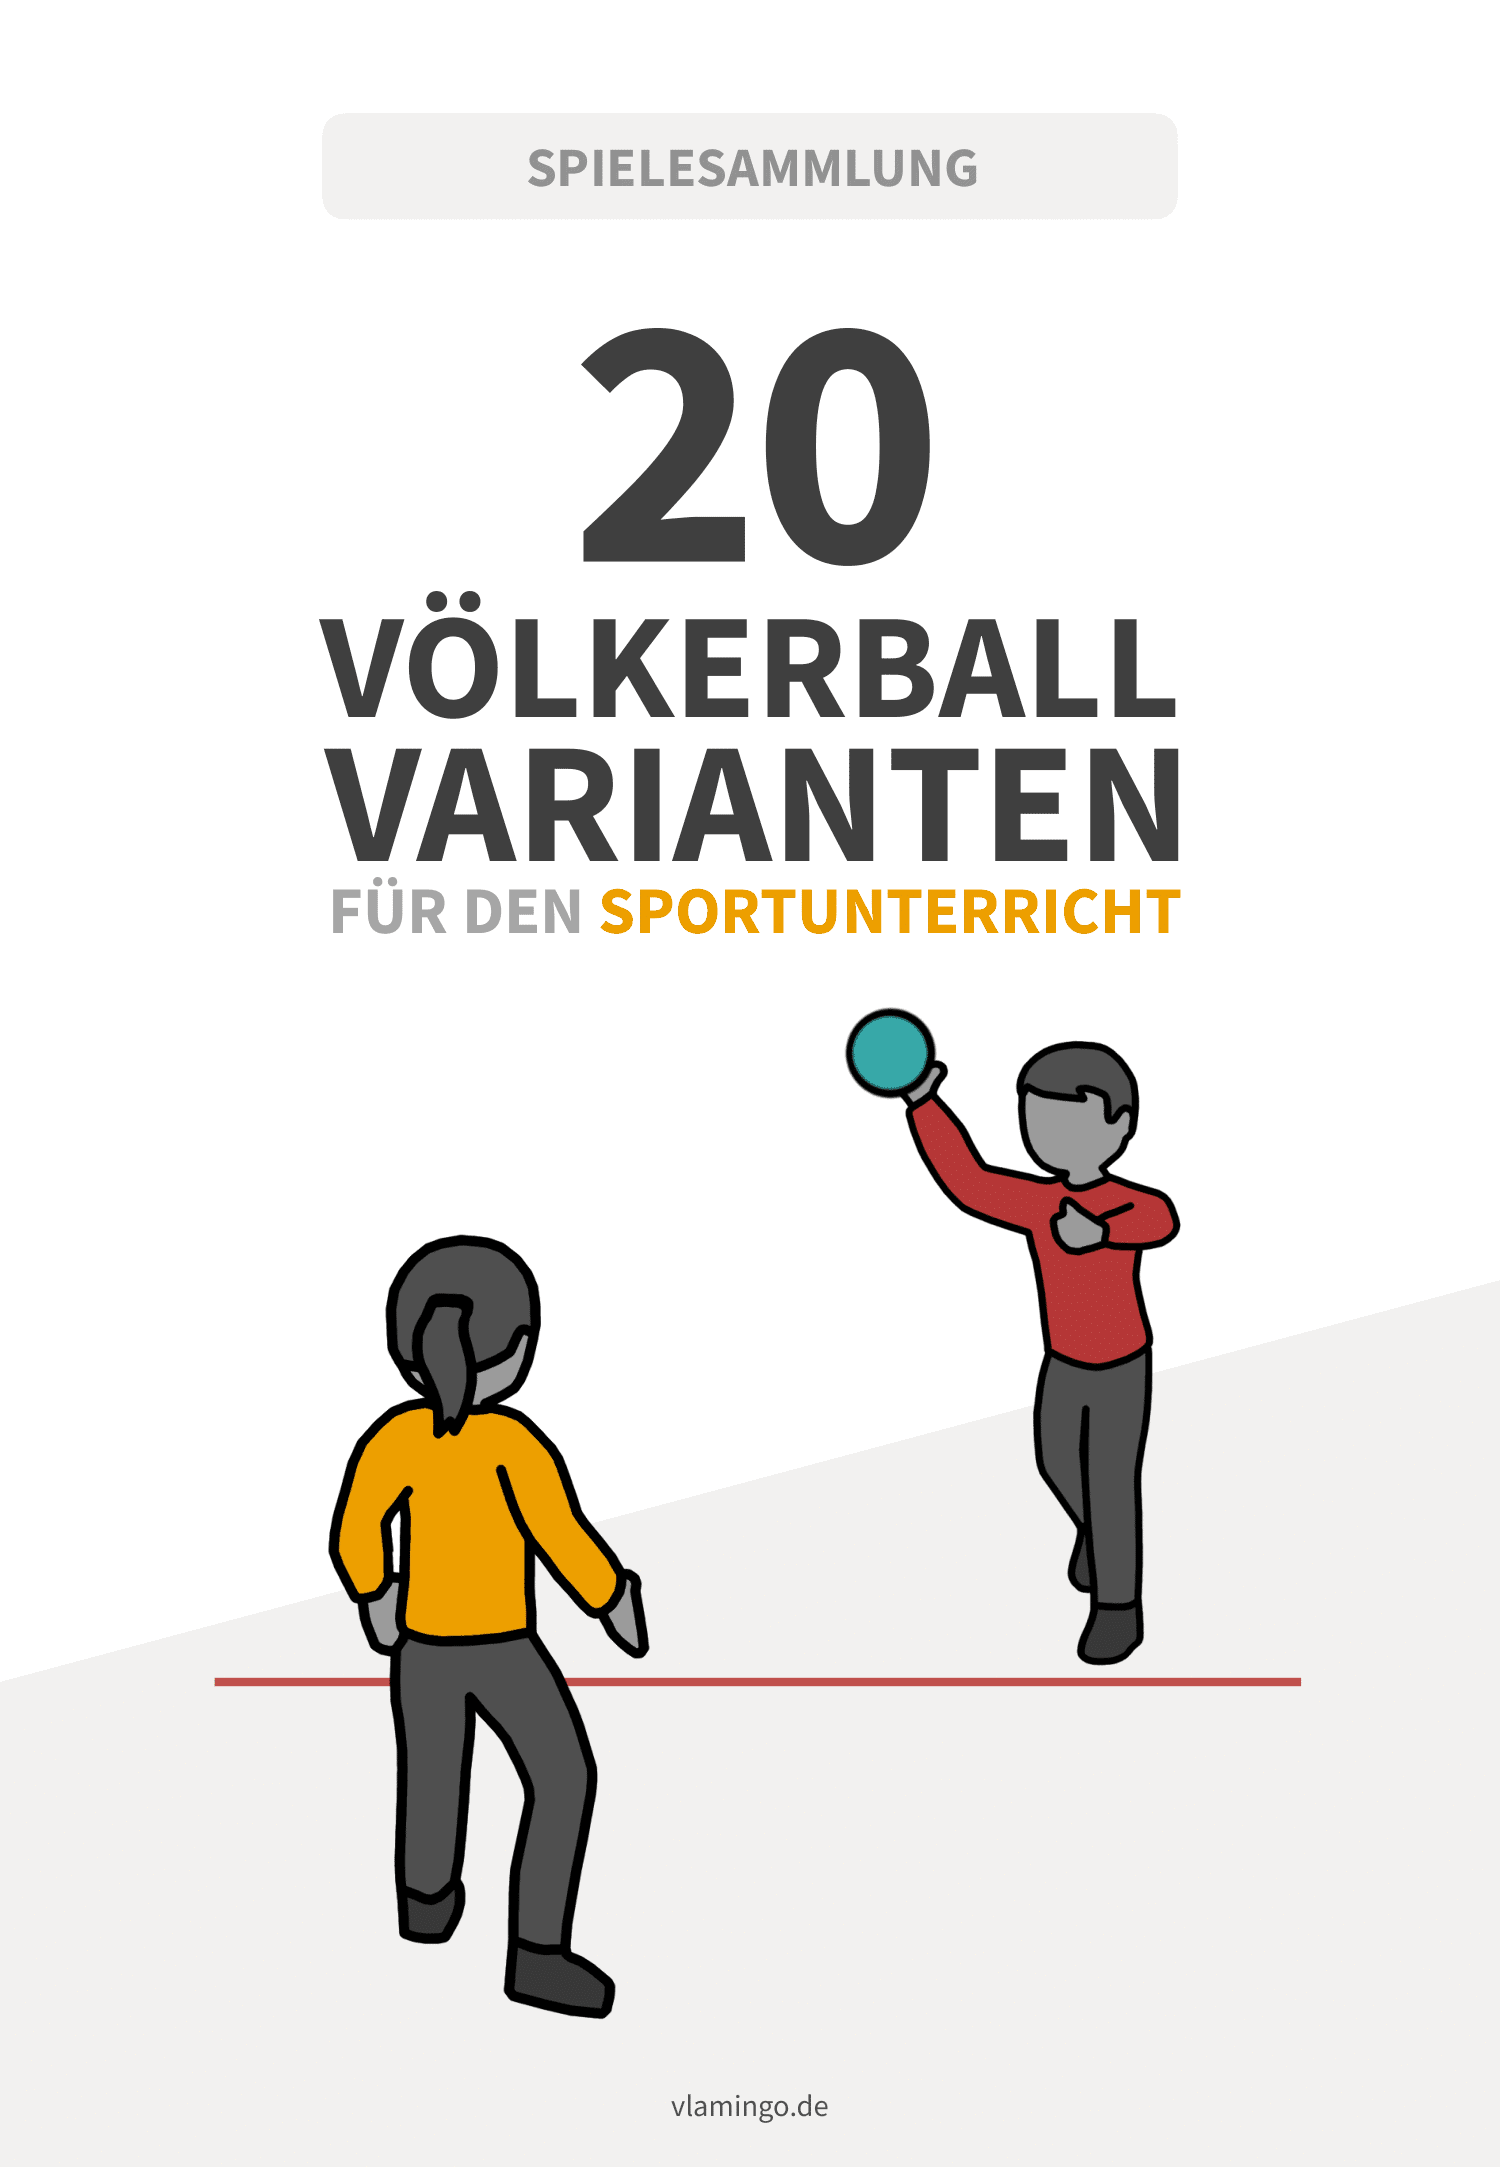 Völkerball - 20 Varianten für den Sportunterricht